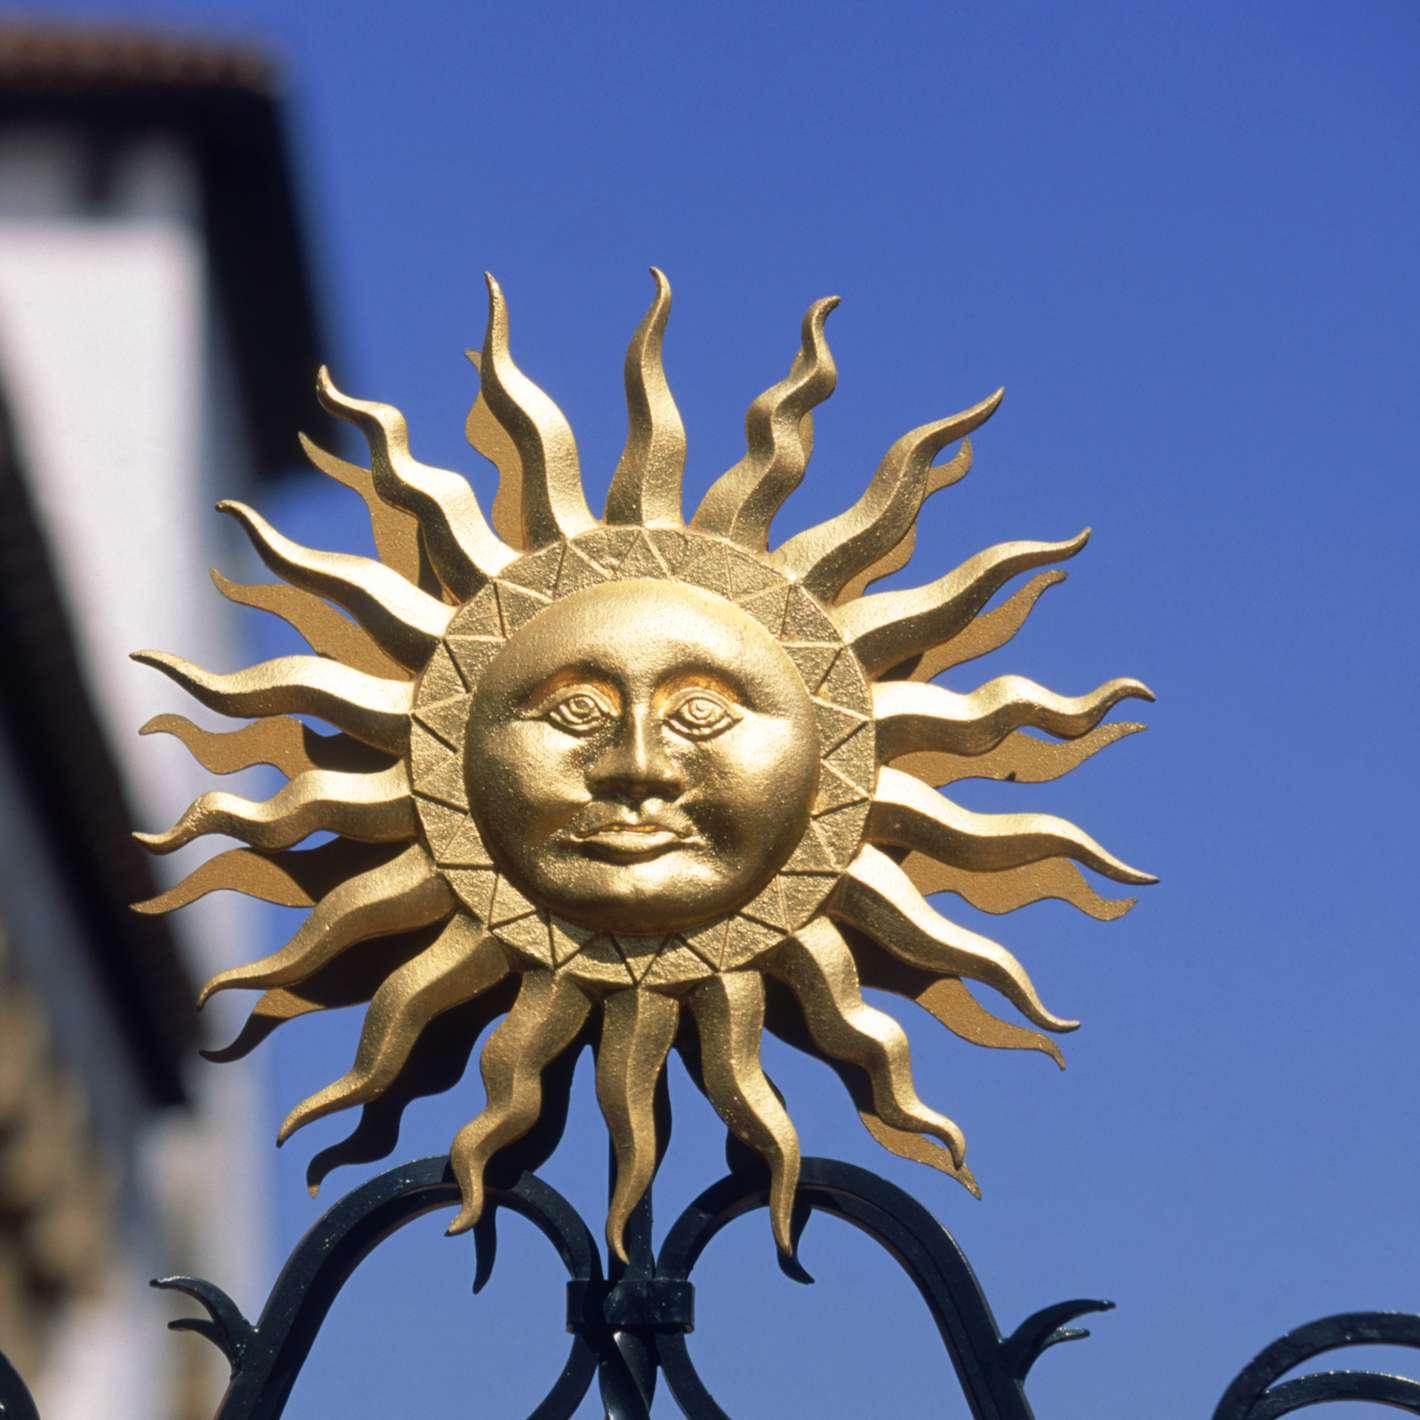 Sun statue in Santa Barbara, CA